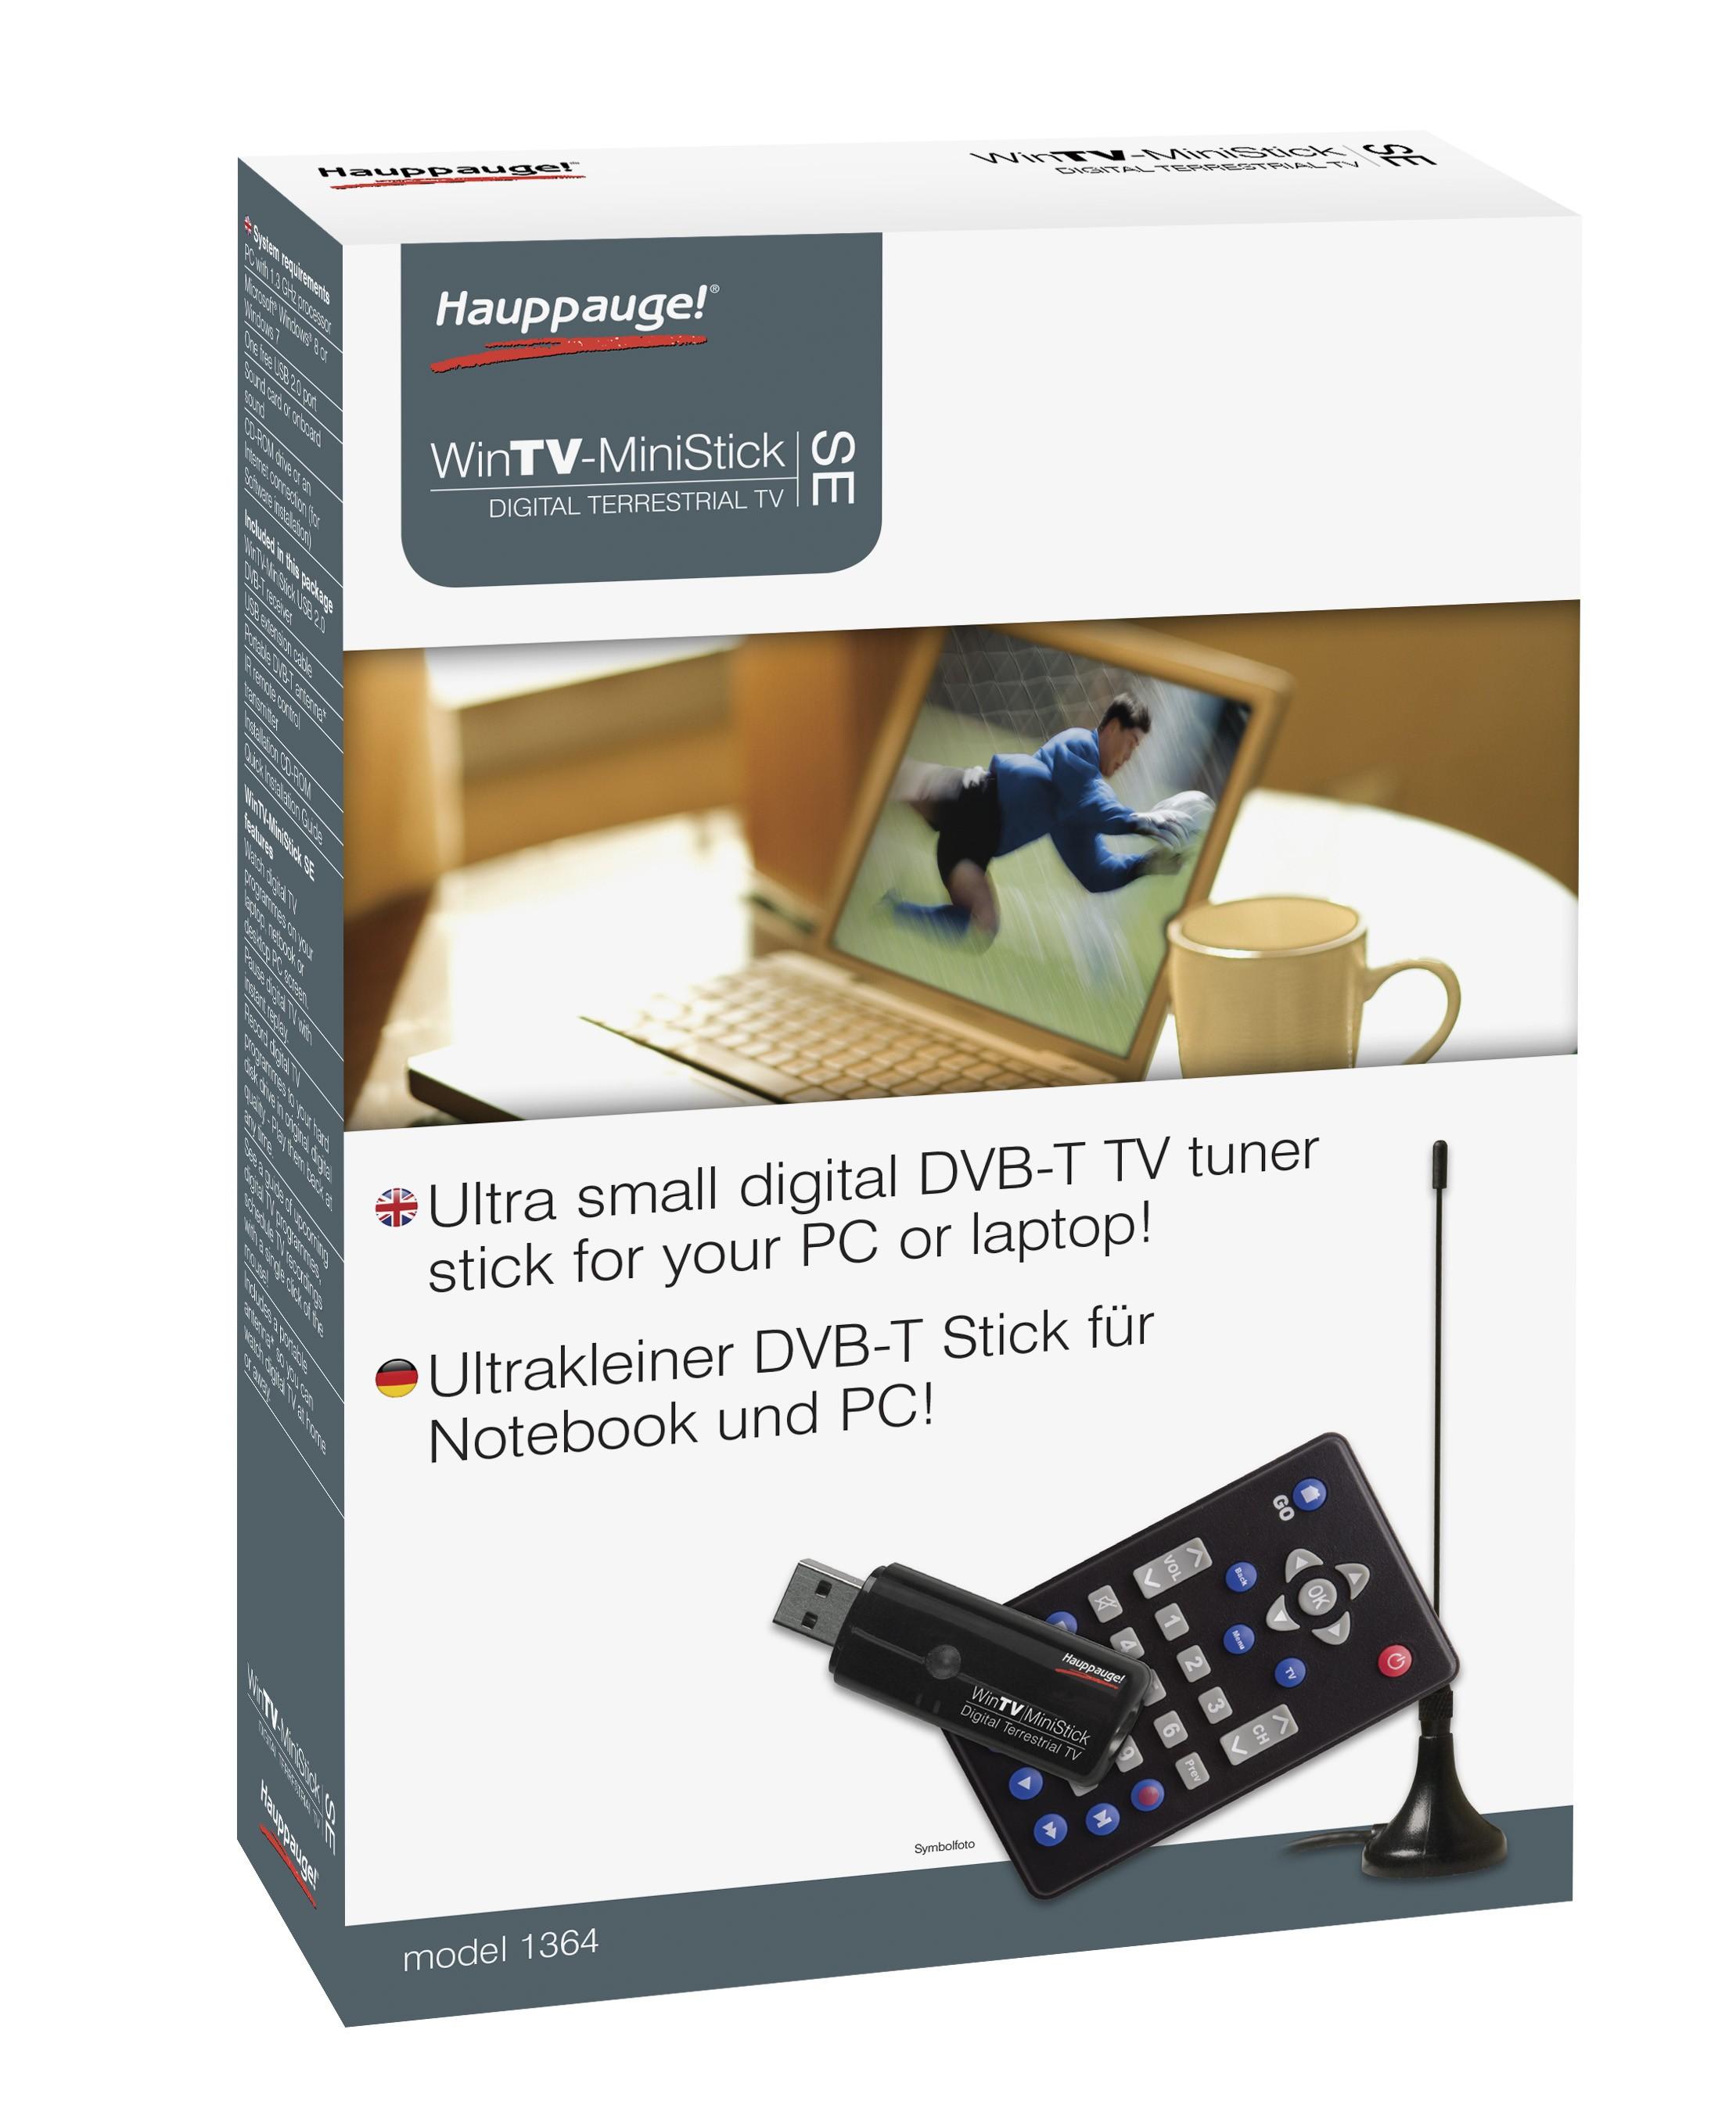 hauppauge wintv ministick dvb t fernseher tuner receiver. Black Bedroom Furniture Sets. Home Design Ideas